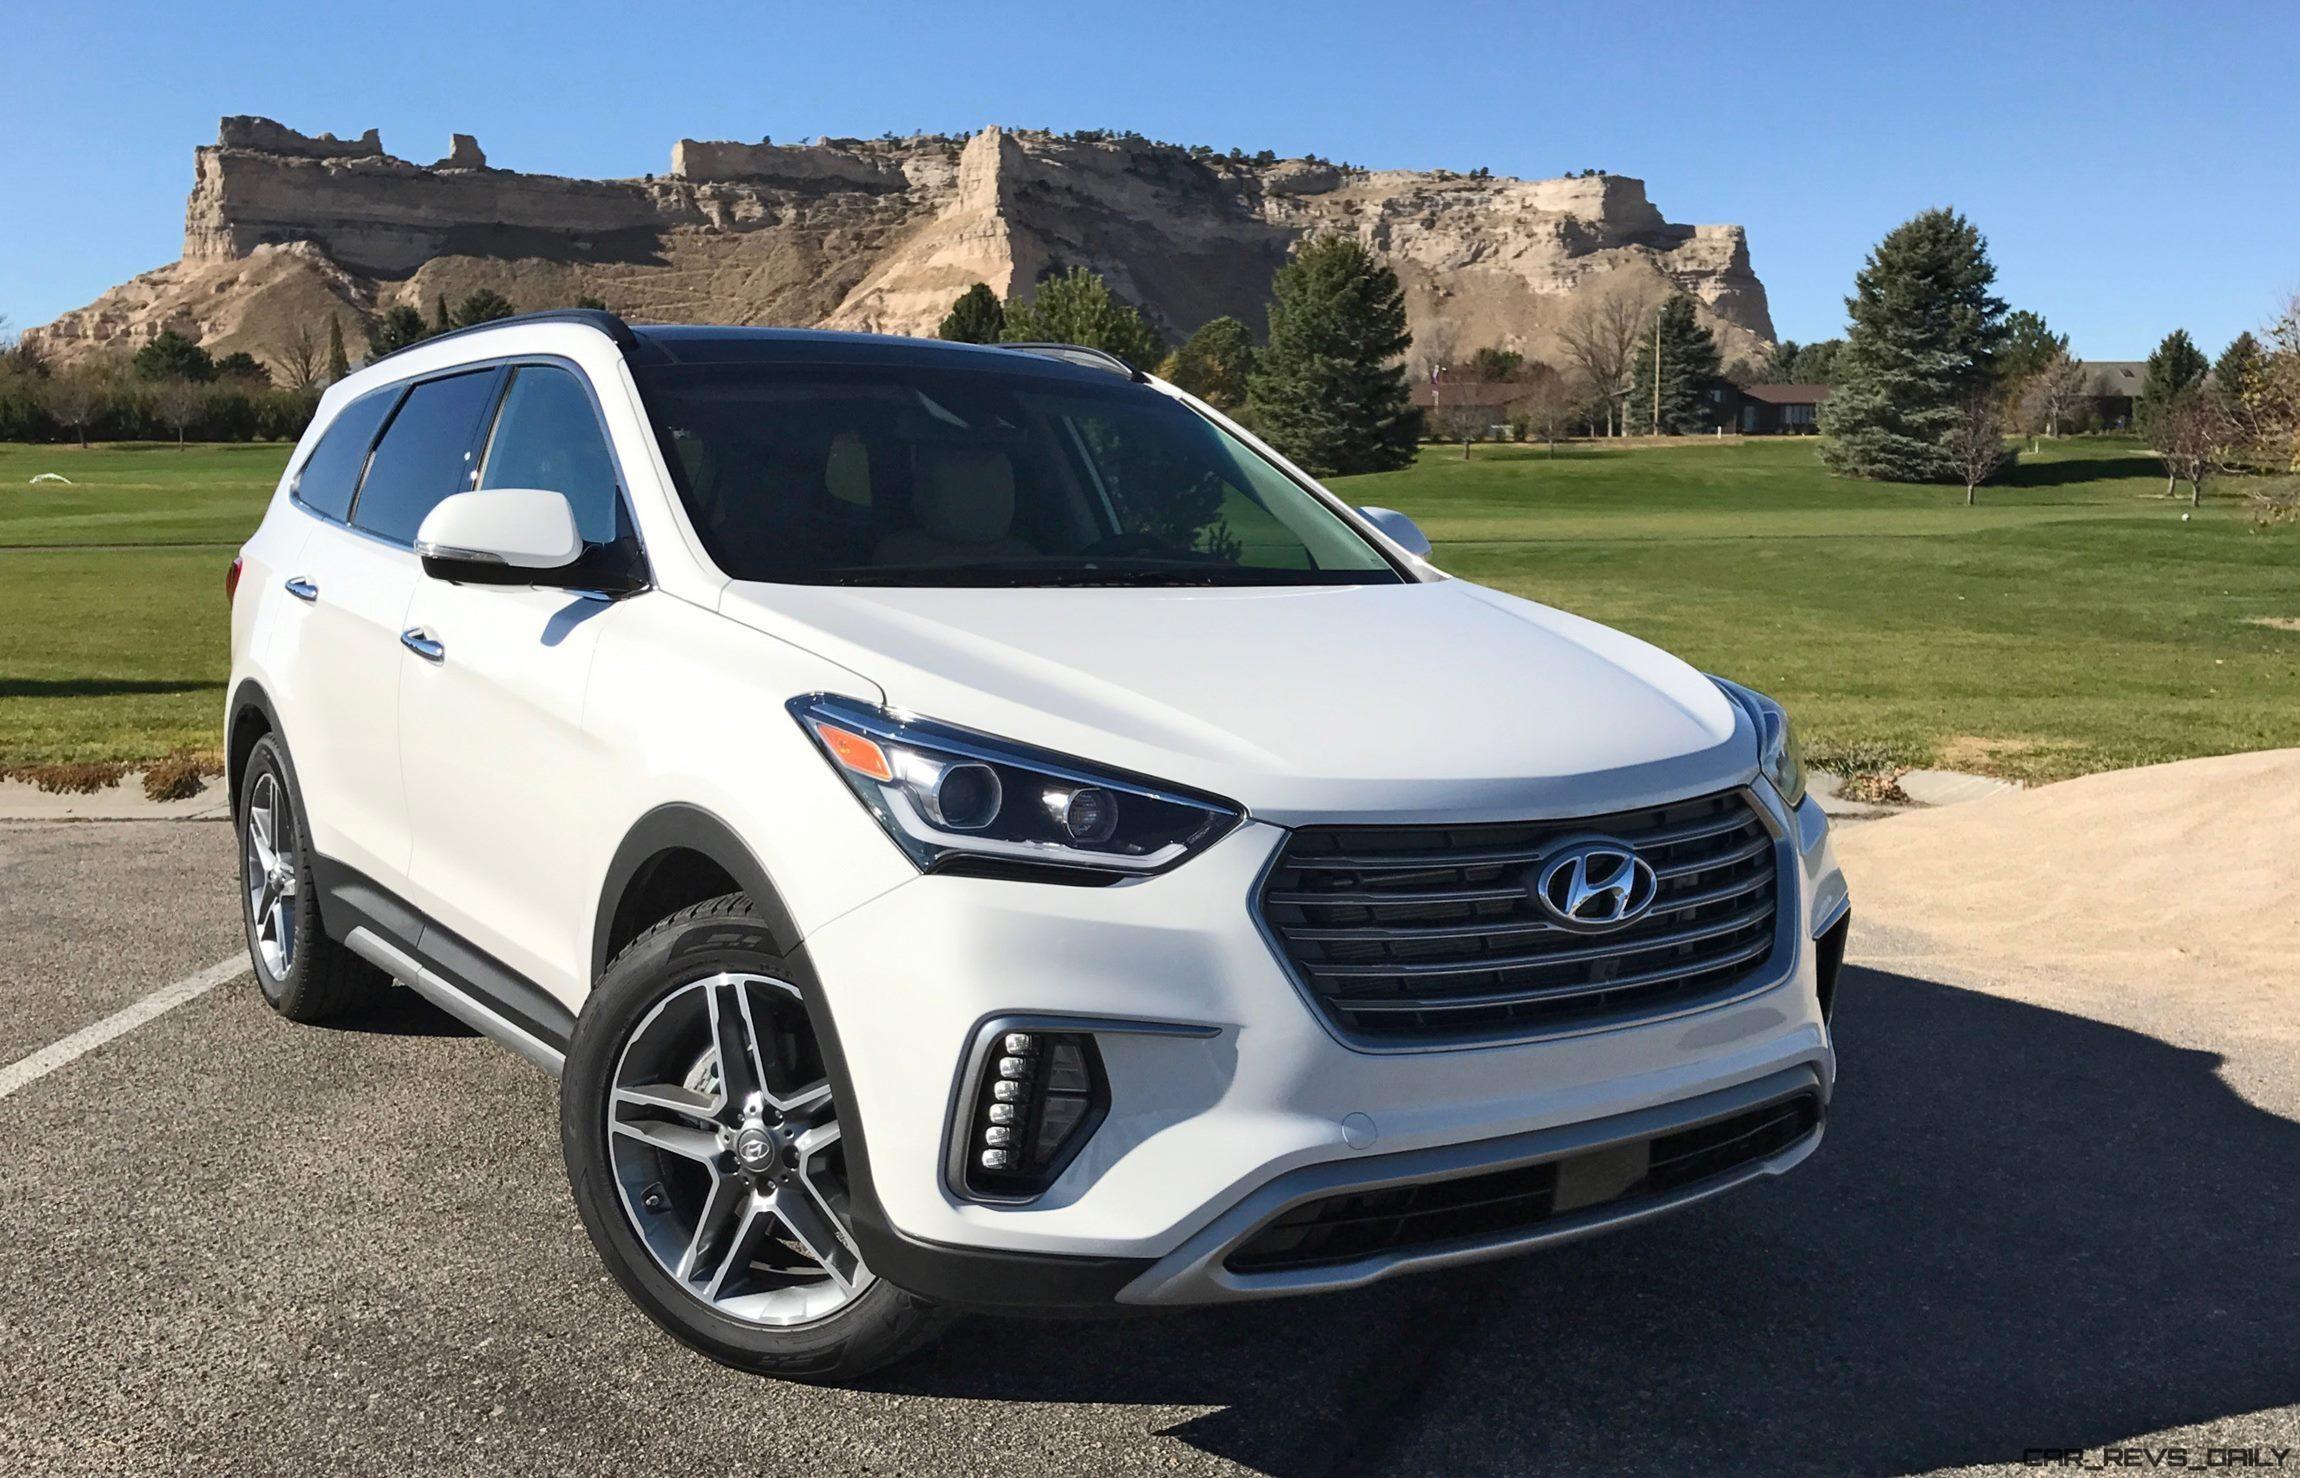 2017 Hyundai Santa Fe Ultimate Road Test Review By Tim Esterdahl Car Shopping Car Revs Daily Com Hyundai Santa Fe Hyundai Road Test